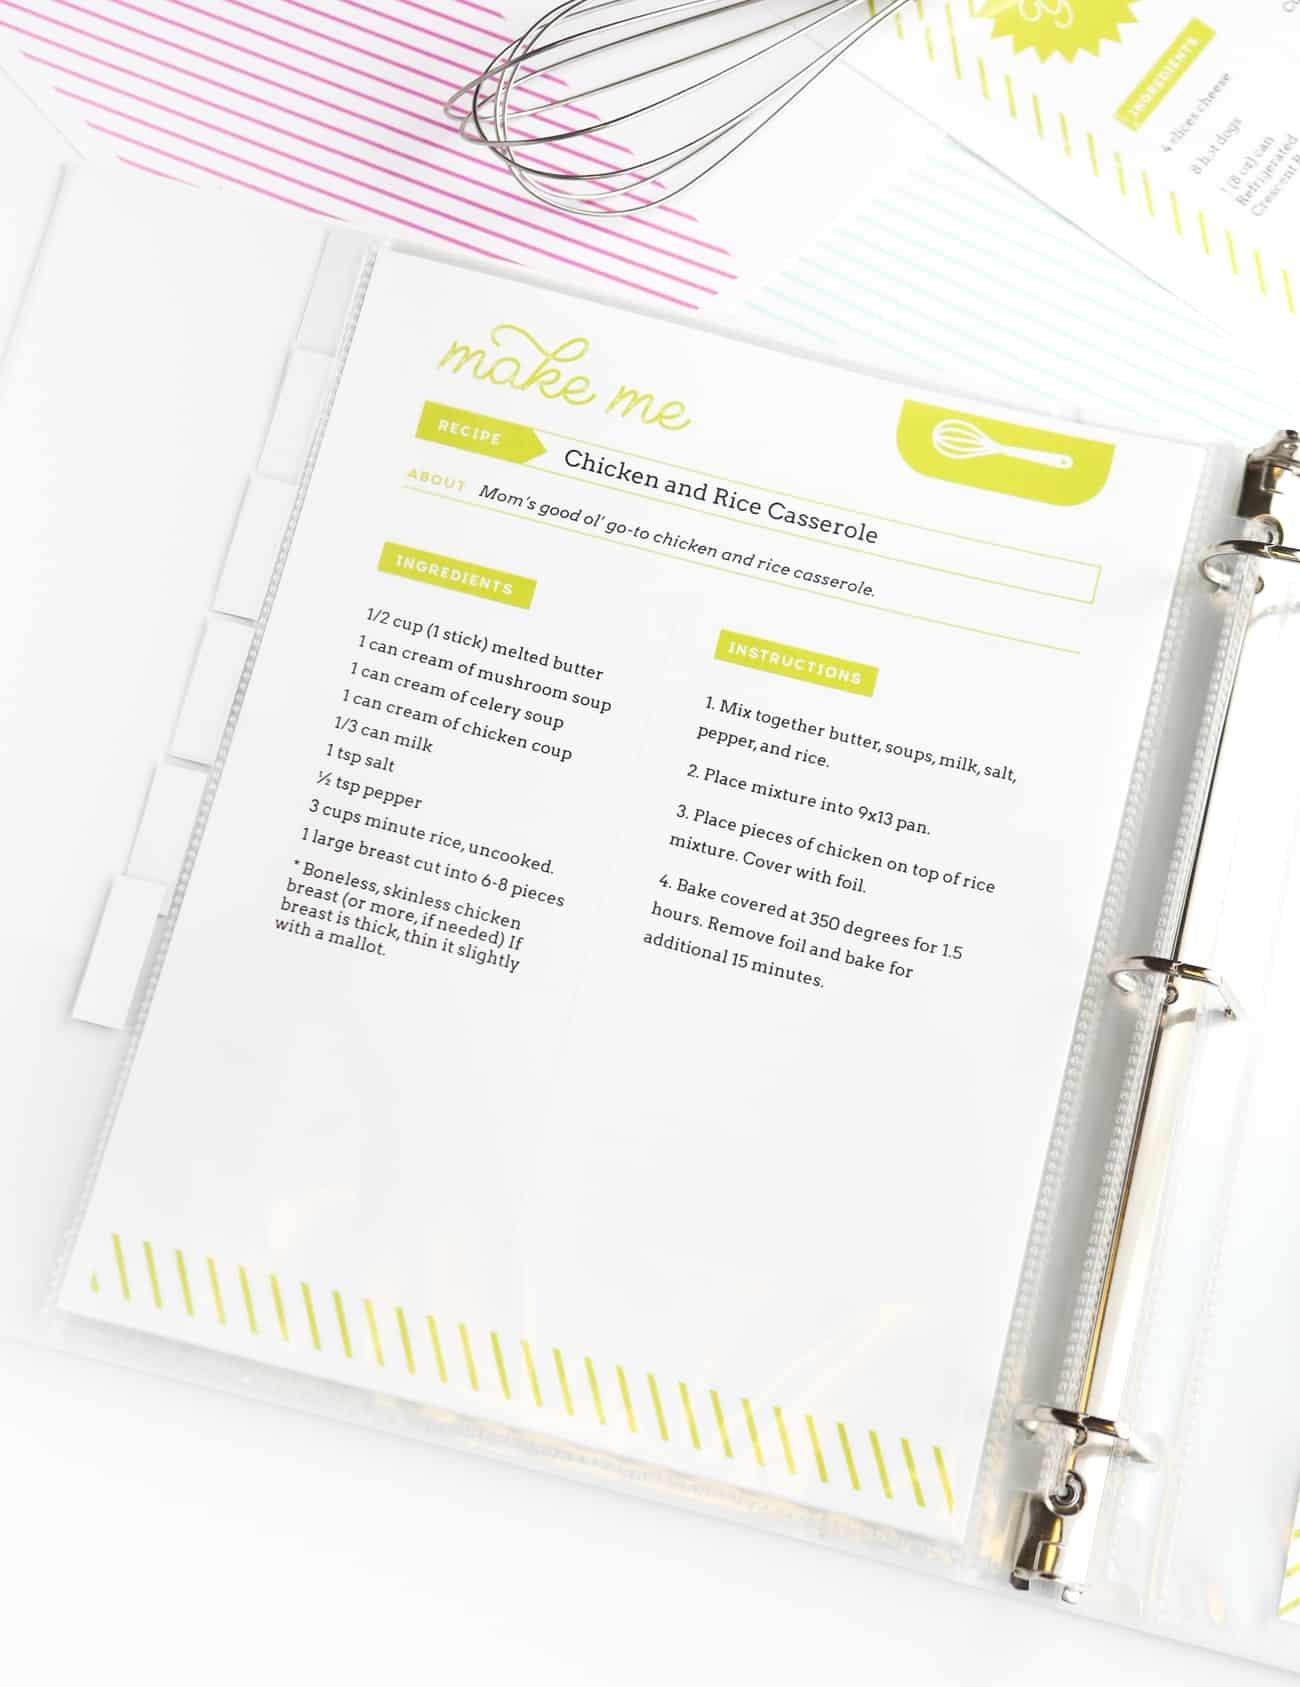 Diy Recipe Book (With Free Printable Recipe Binder Kit!) - Free Printable Recipe Book Pages